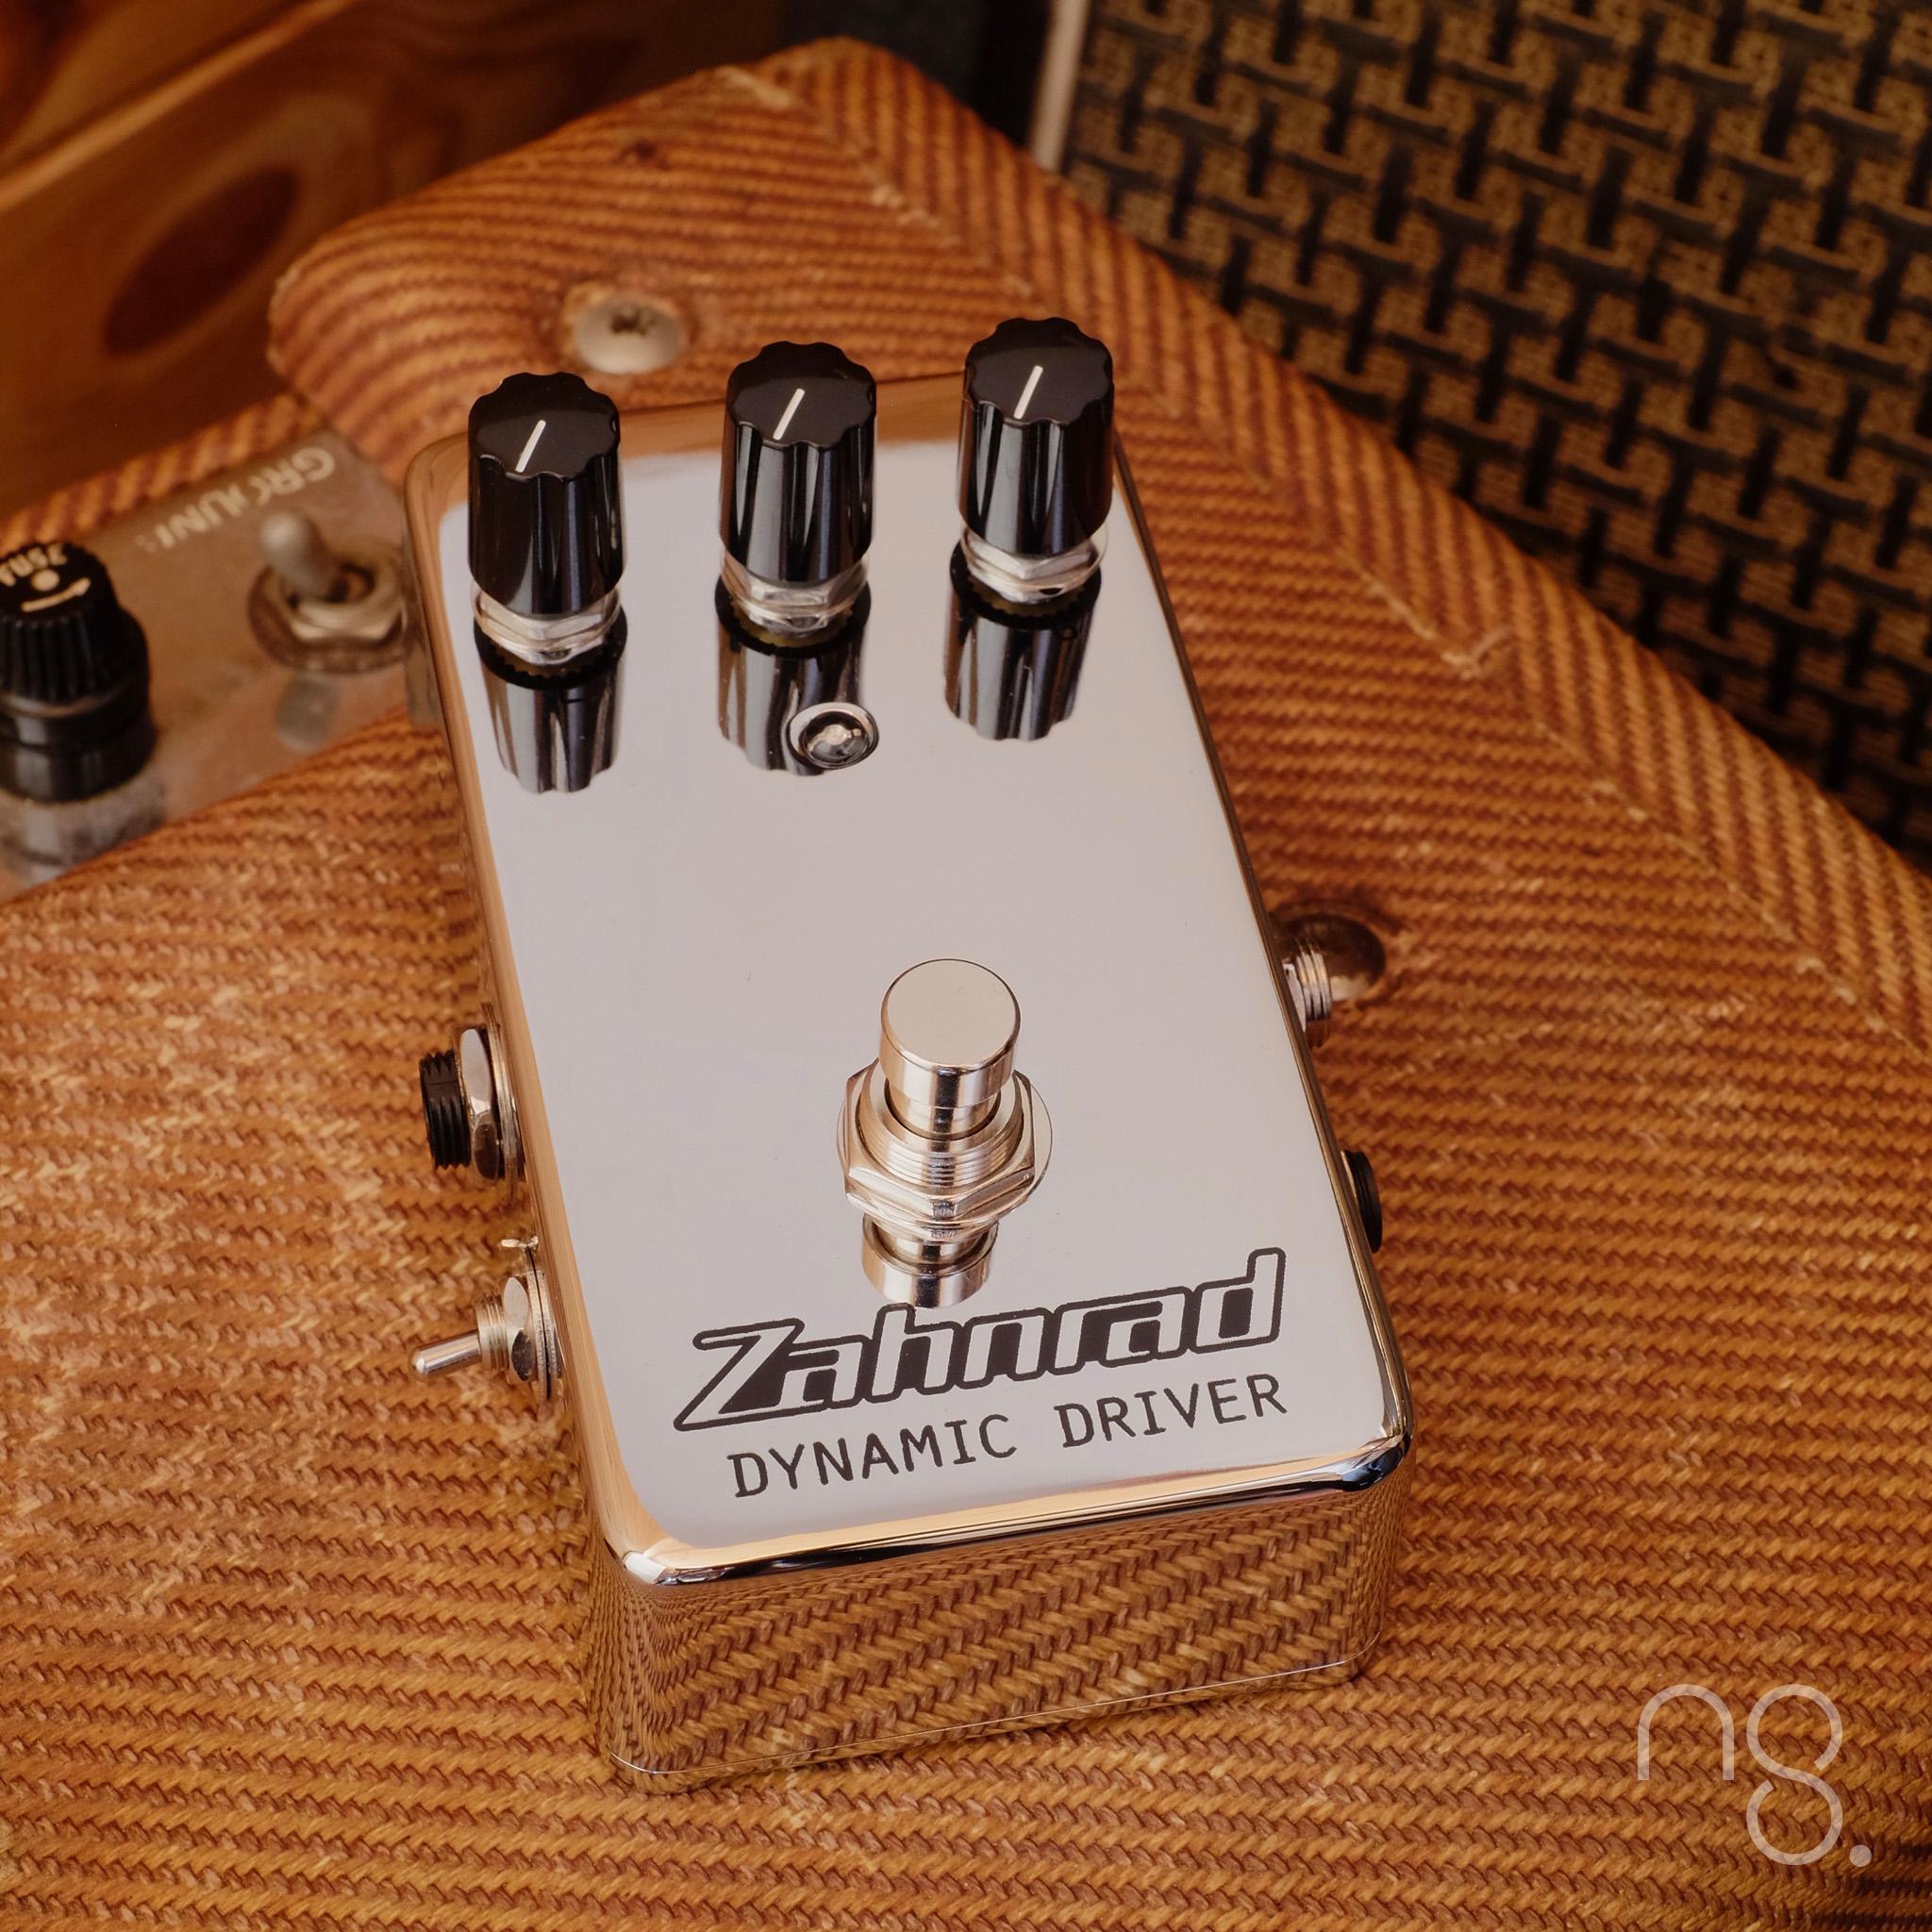 Zahnrad Dynamic Driver